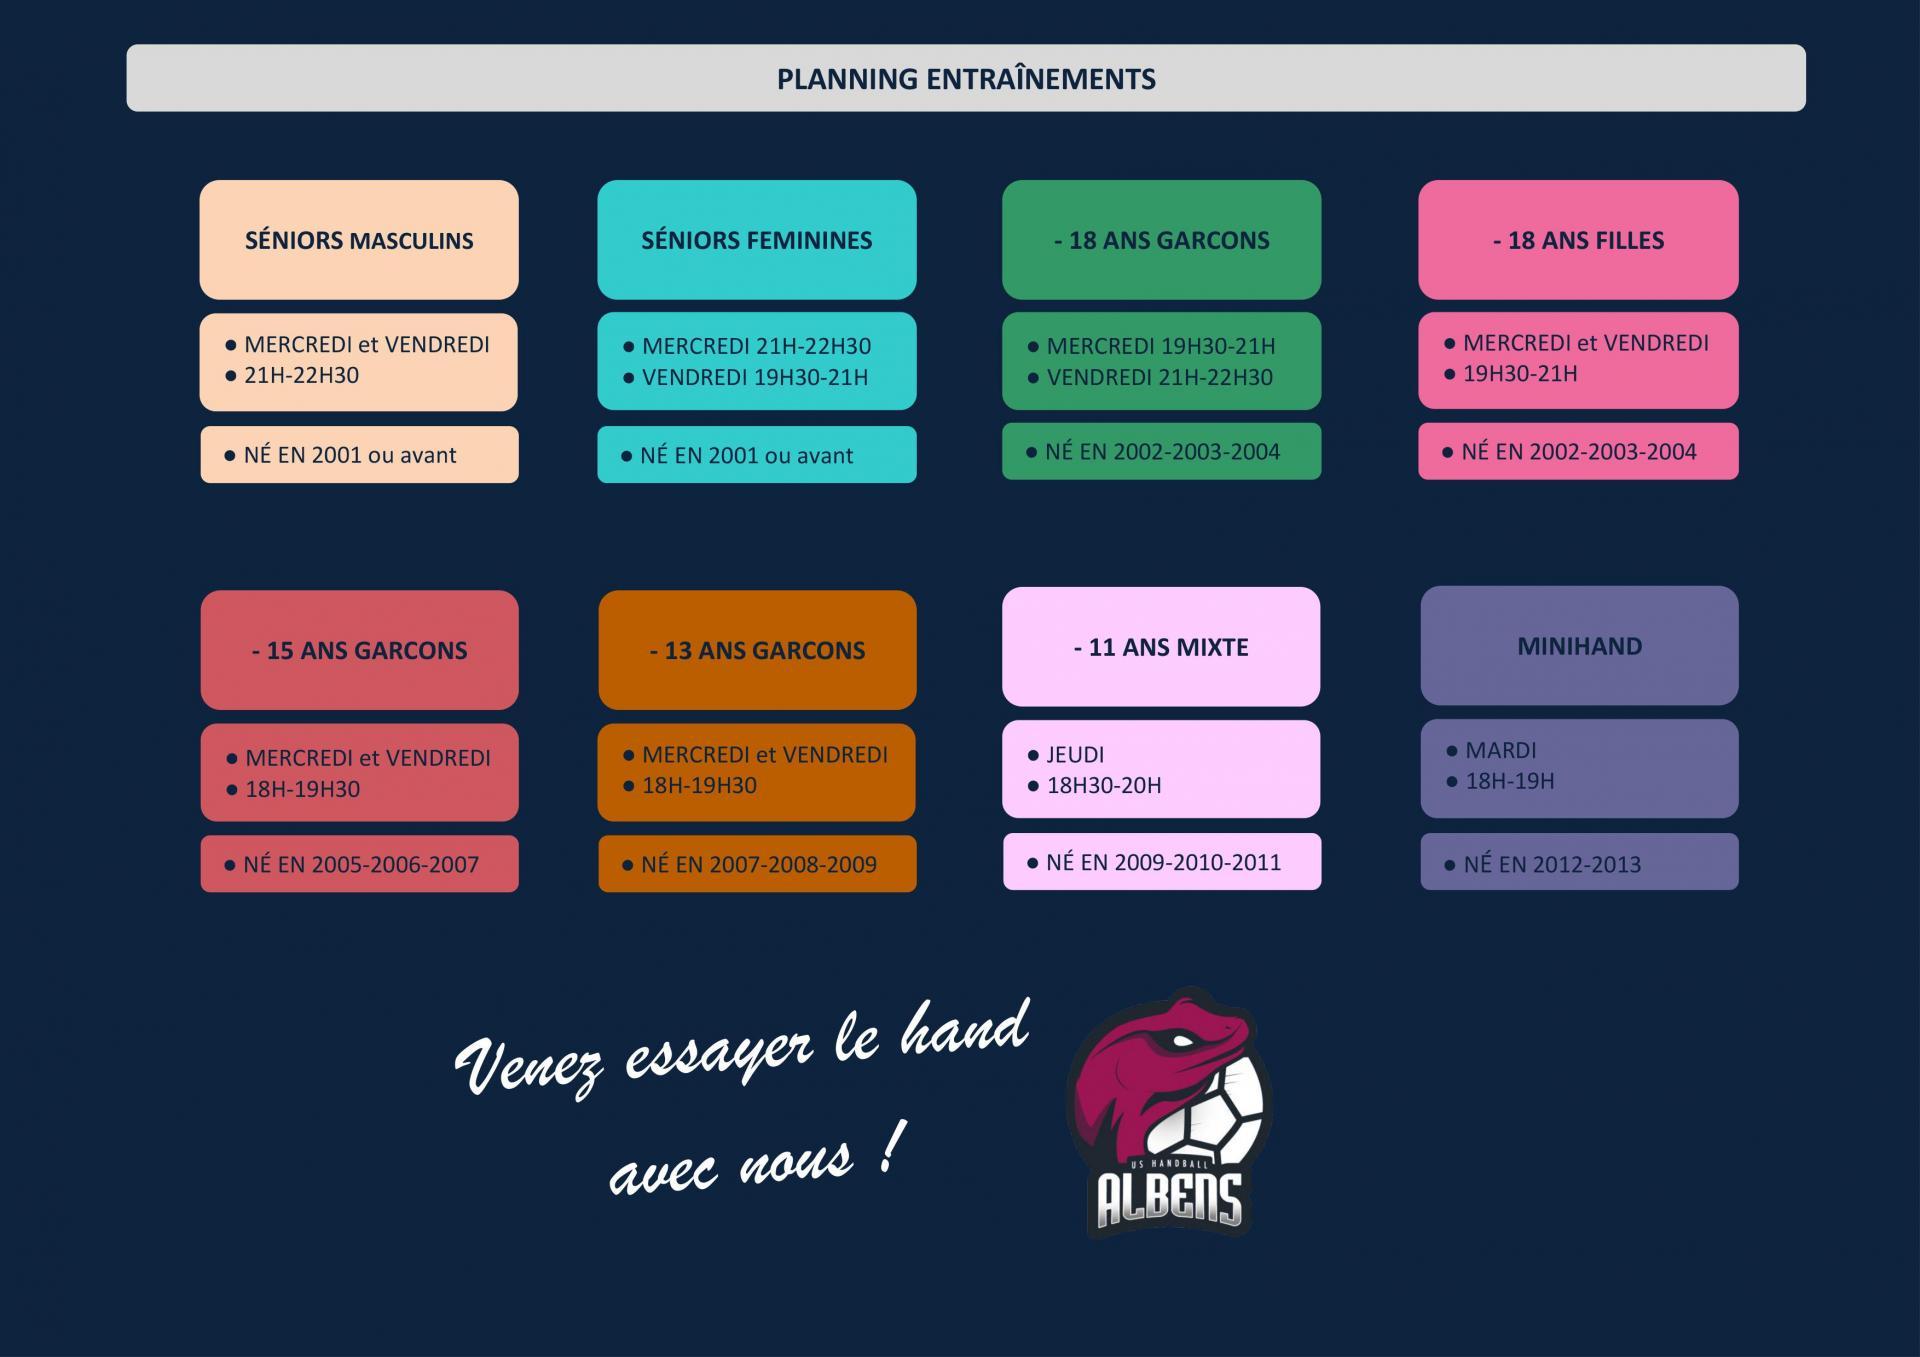 Planning entrainements jpg